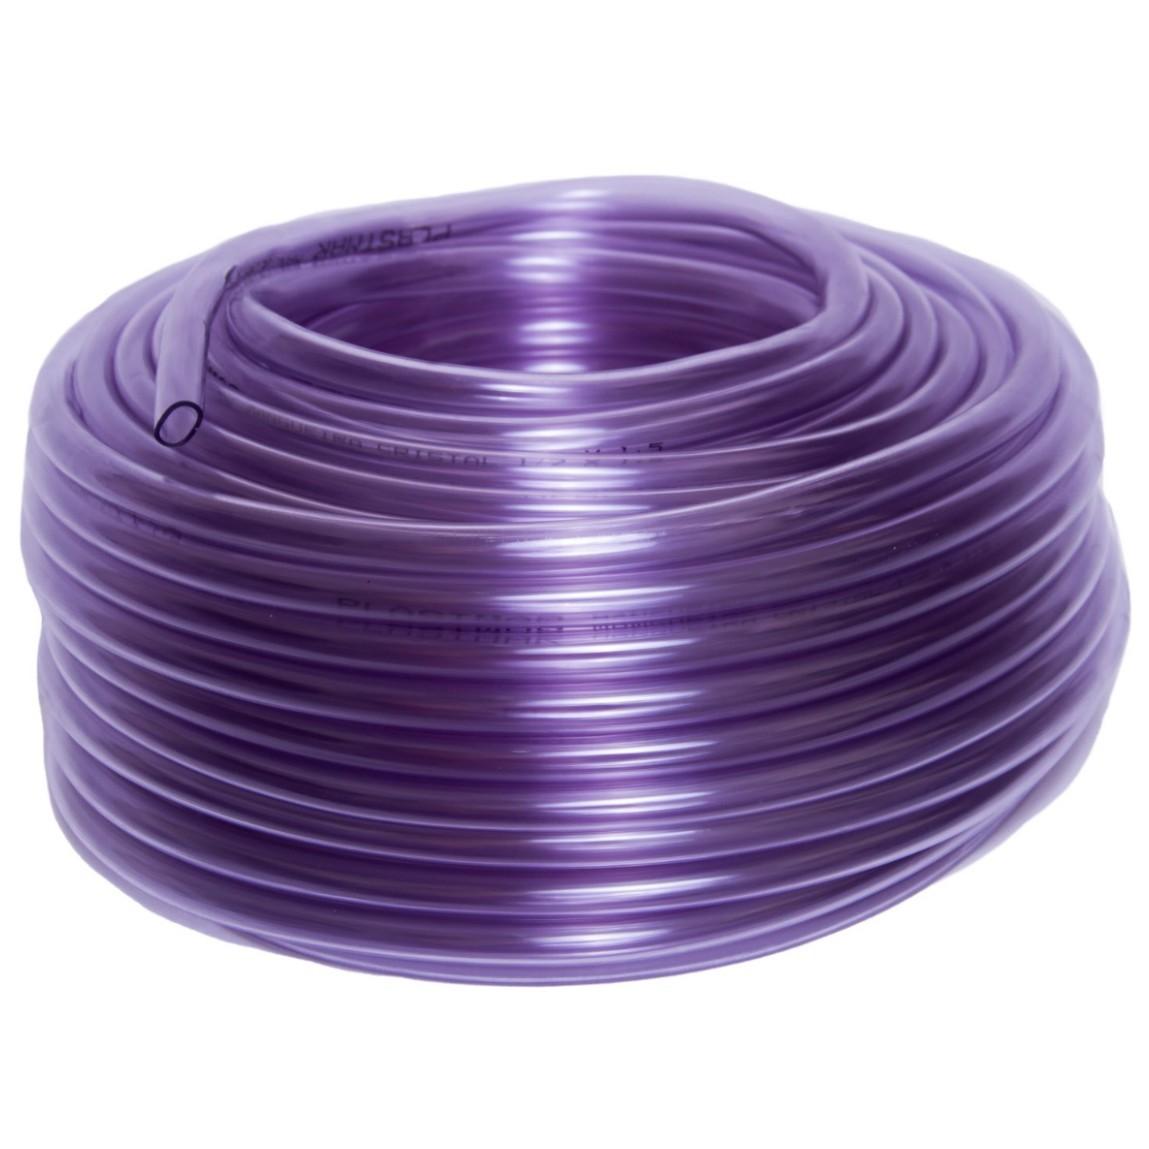 Mangueira de PVC 10m 34 Roxa 803 - Plastmar